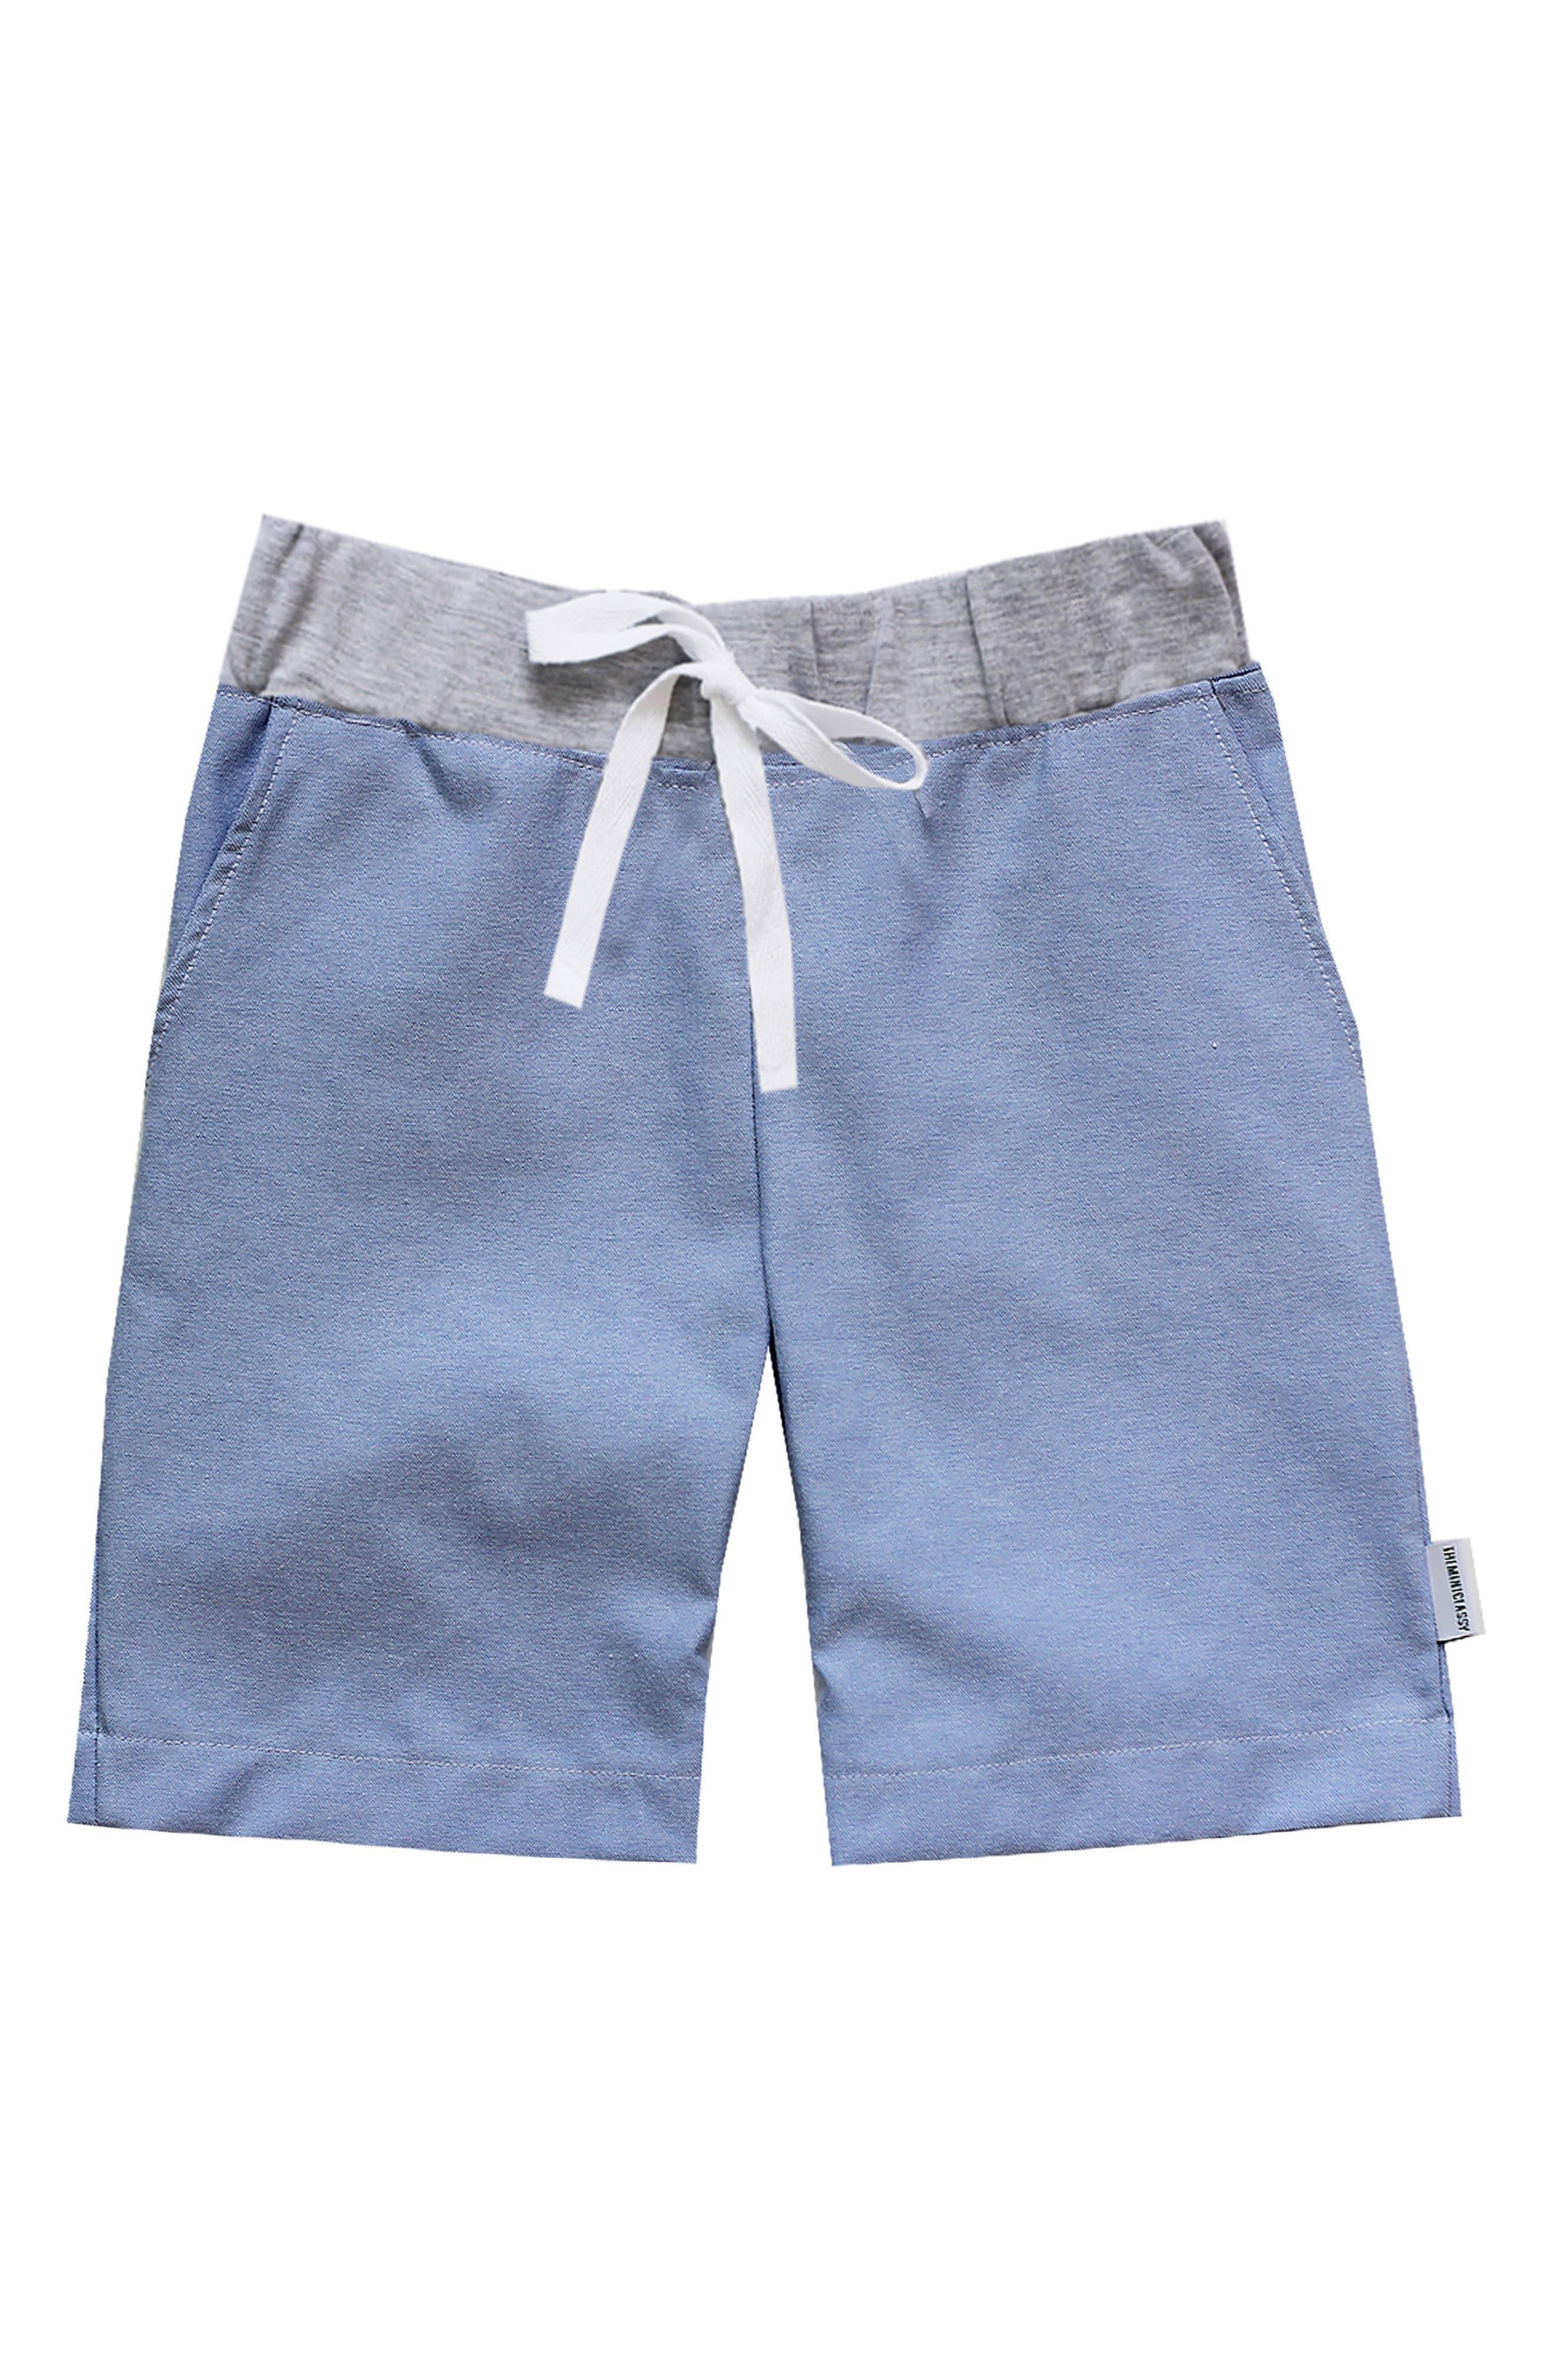 Chambray Board Shorts,                         Main,                         color, Light Blue